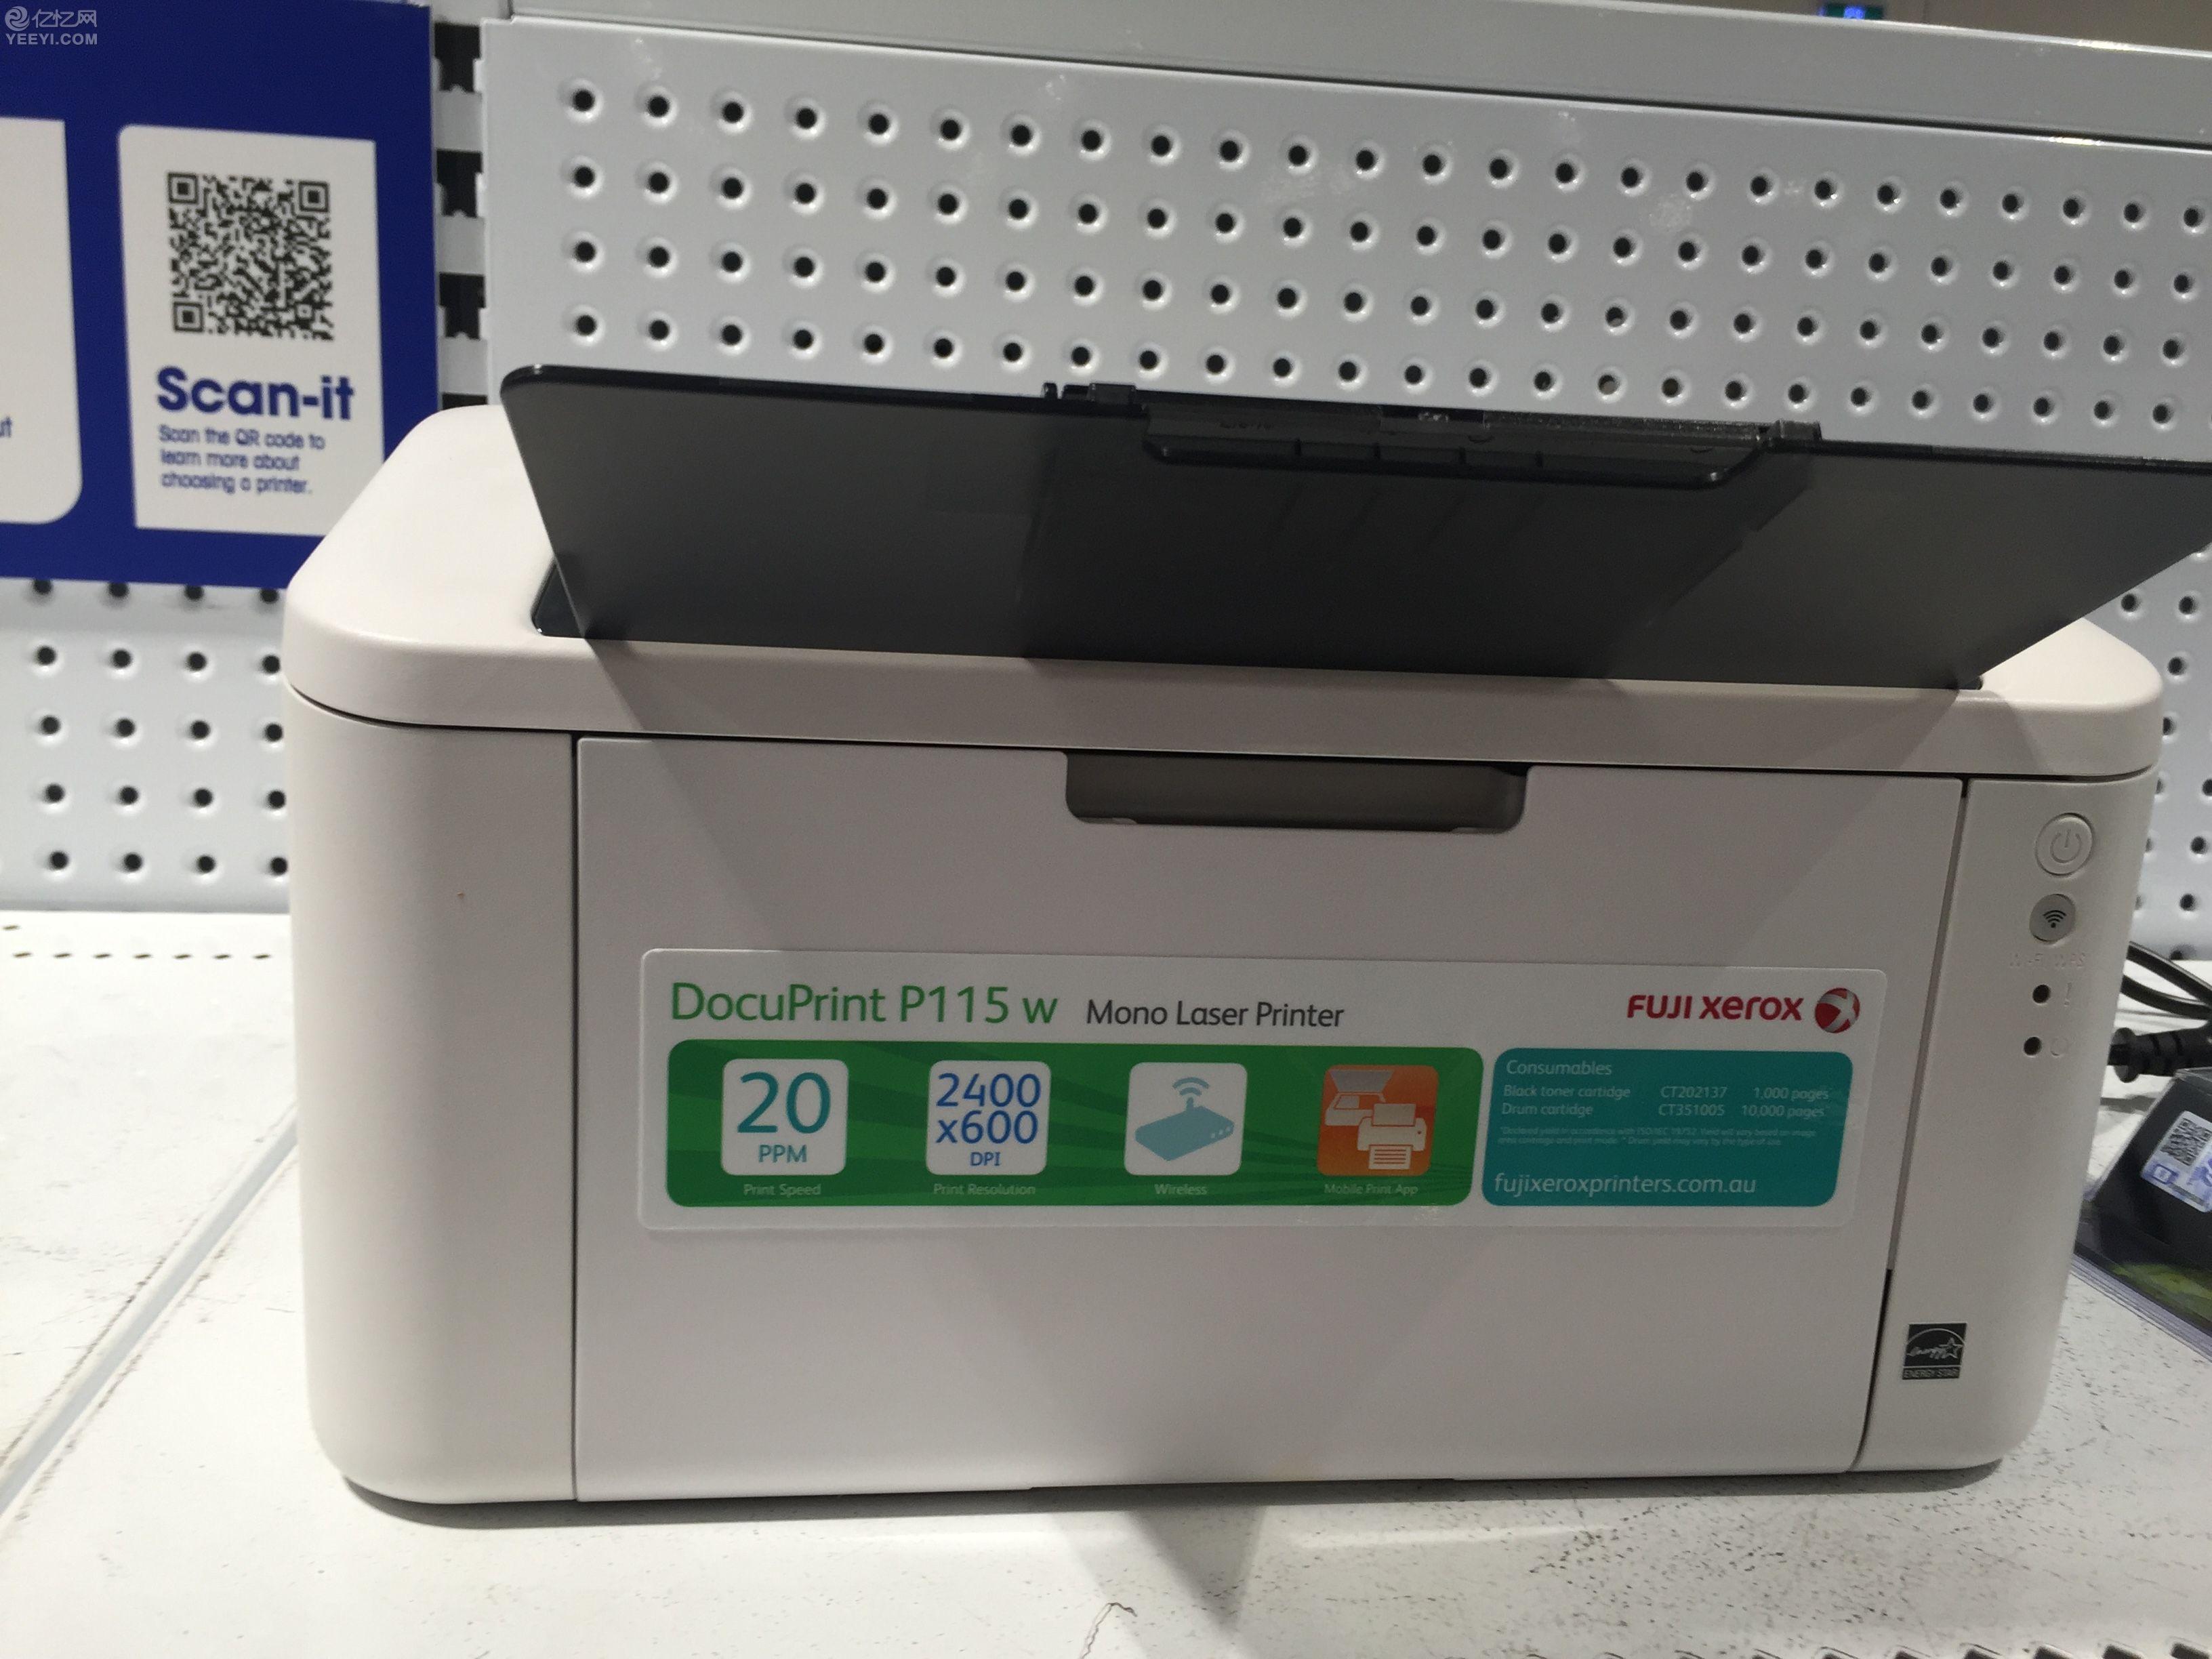 Fuji Xerox Powered By Discuz Docuprint P115 W 95fuji P115w156joyce0438307505 0 Y A6 Q D